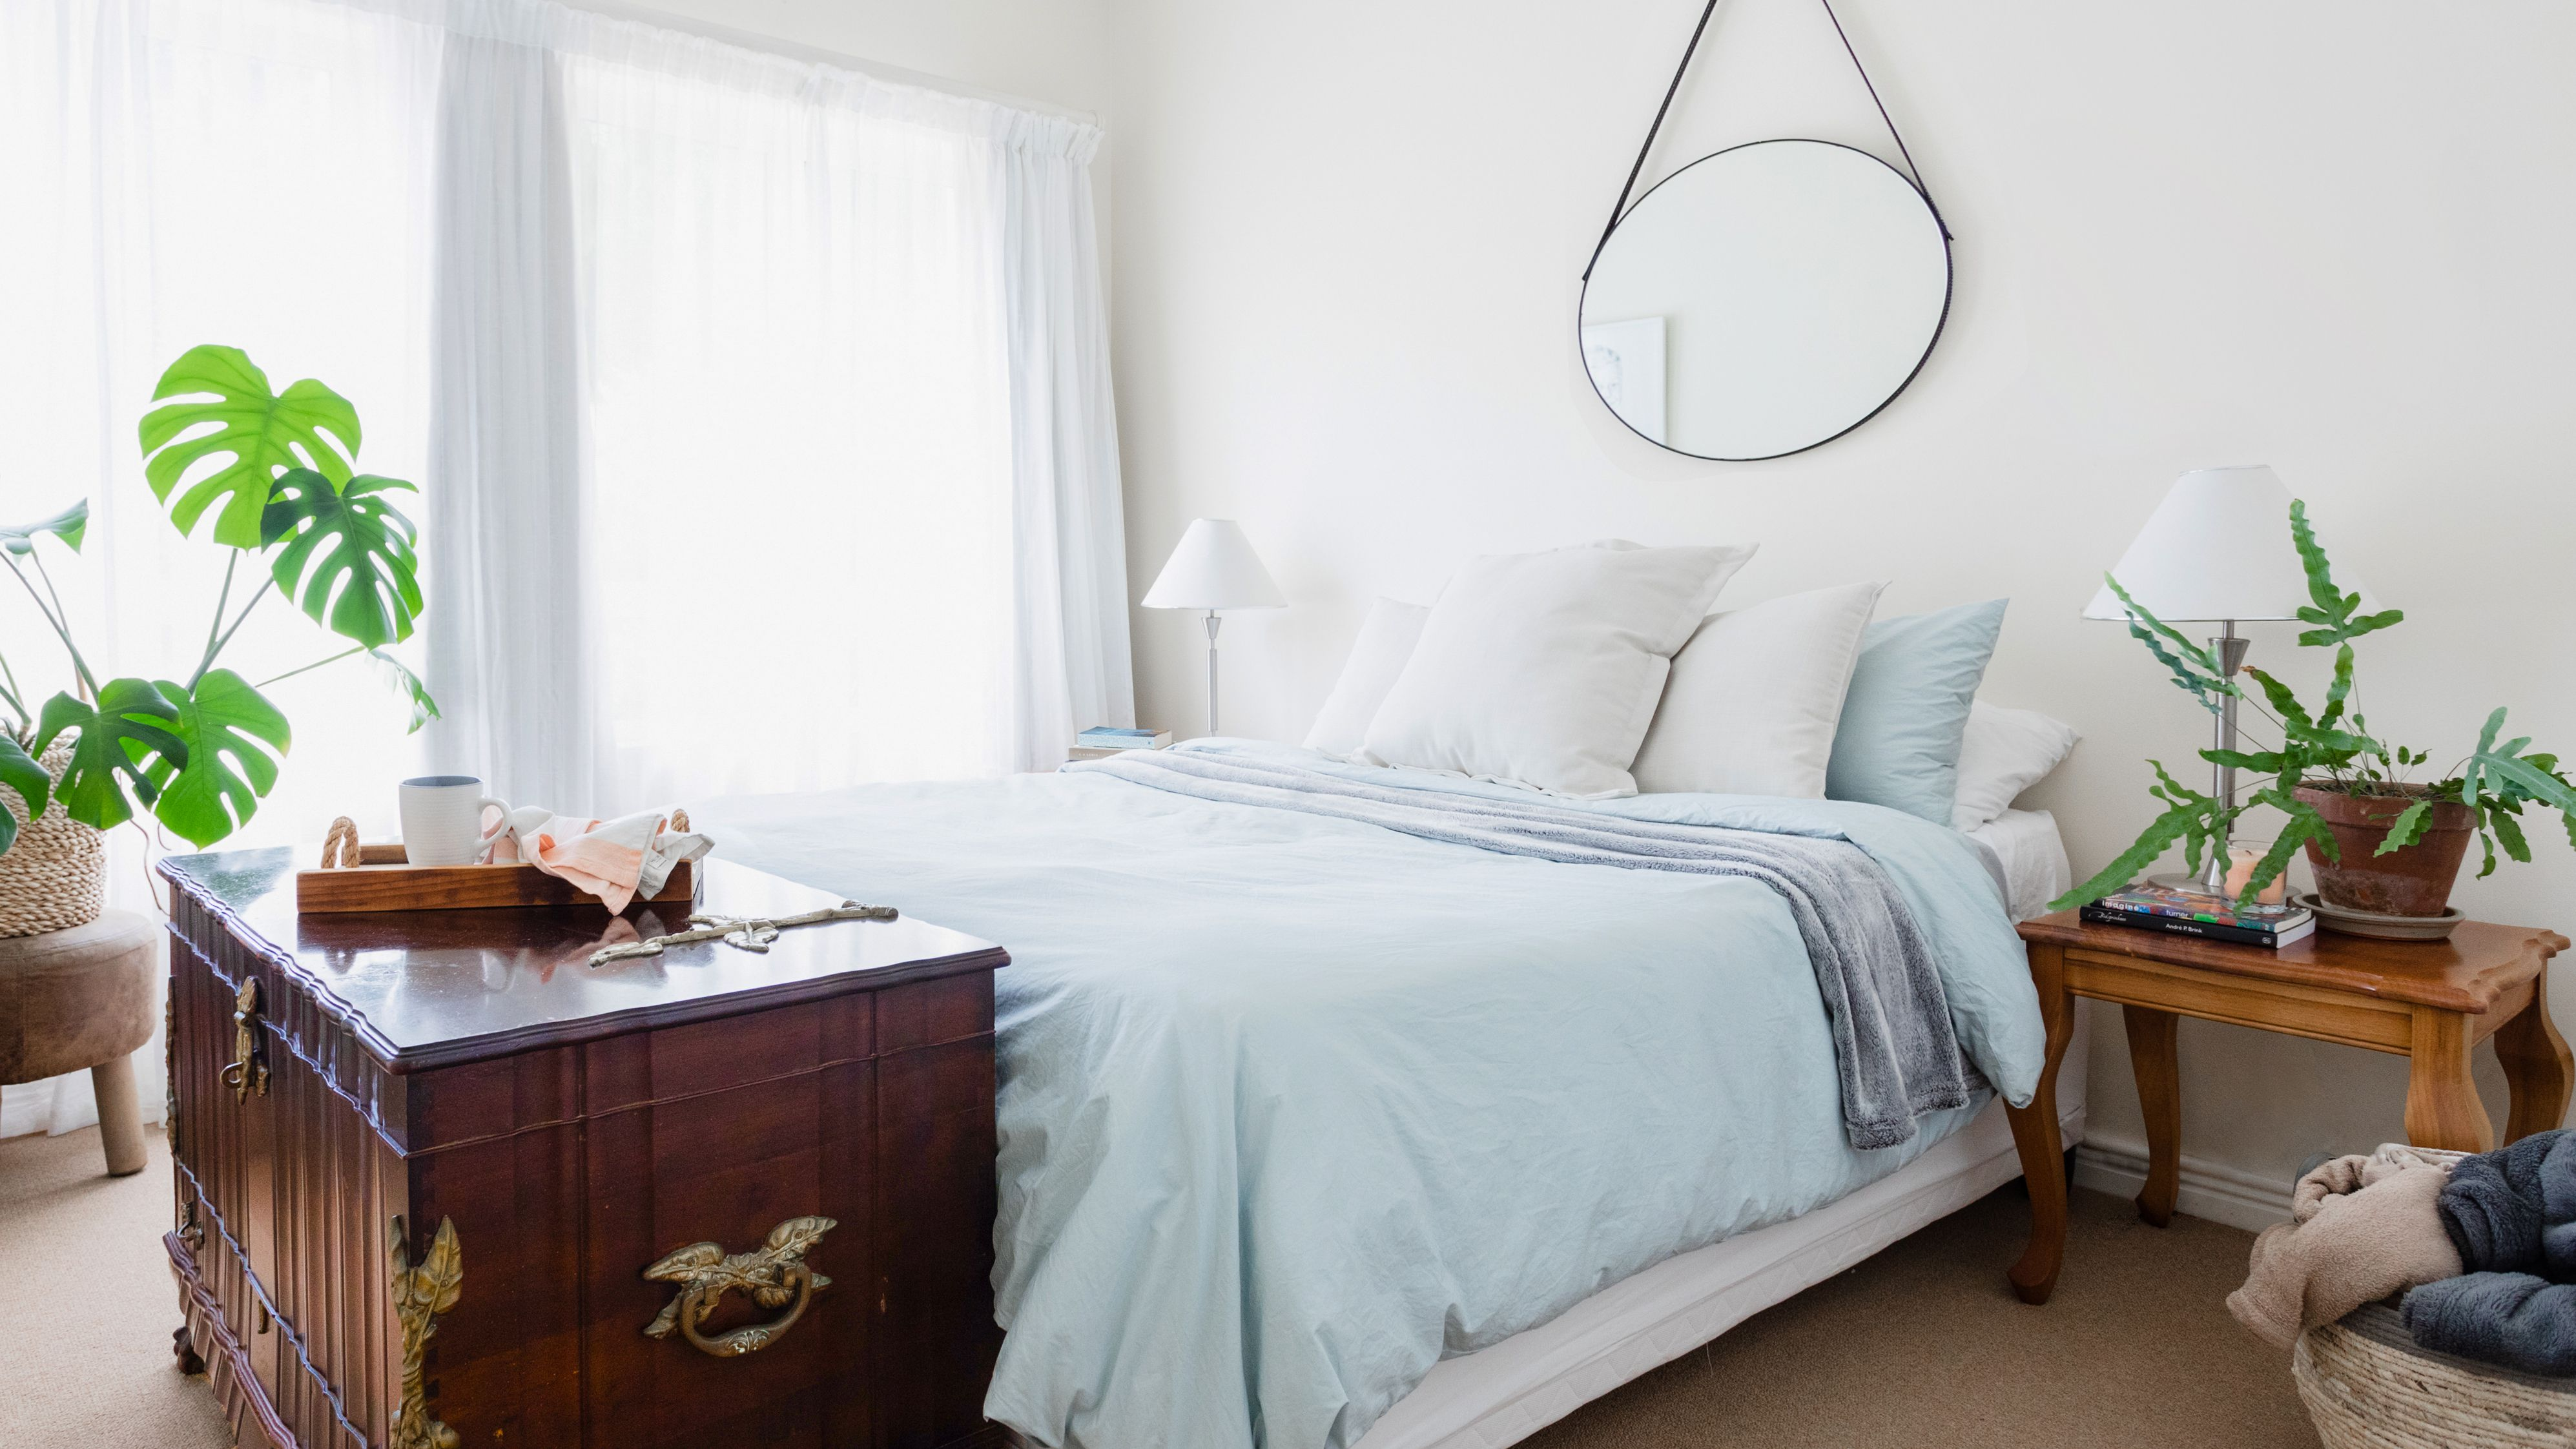 Bedroom ideas small design 50+ Best